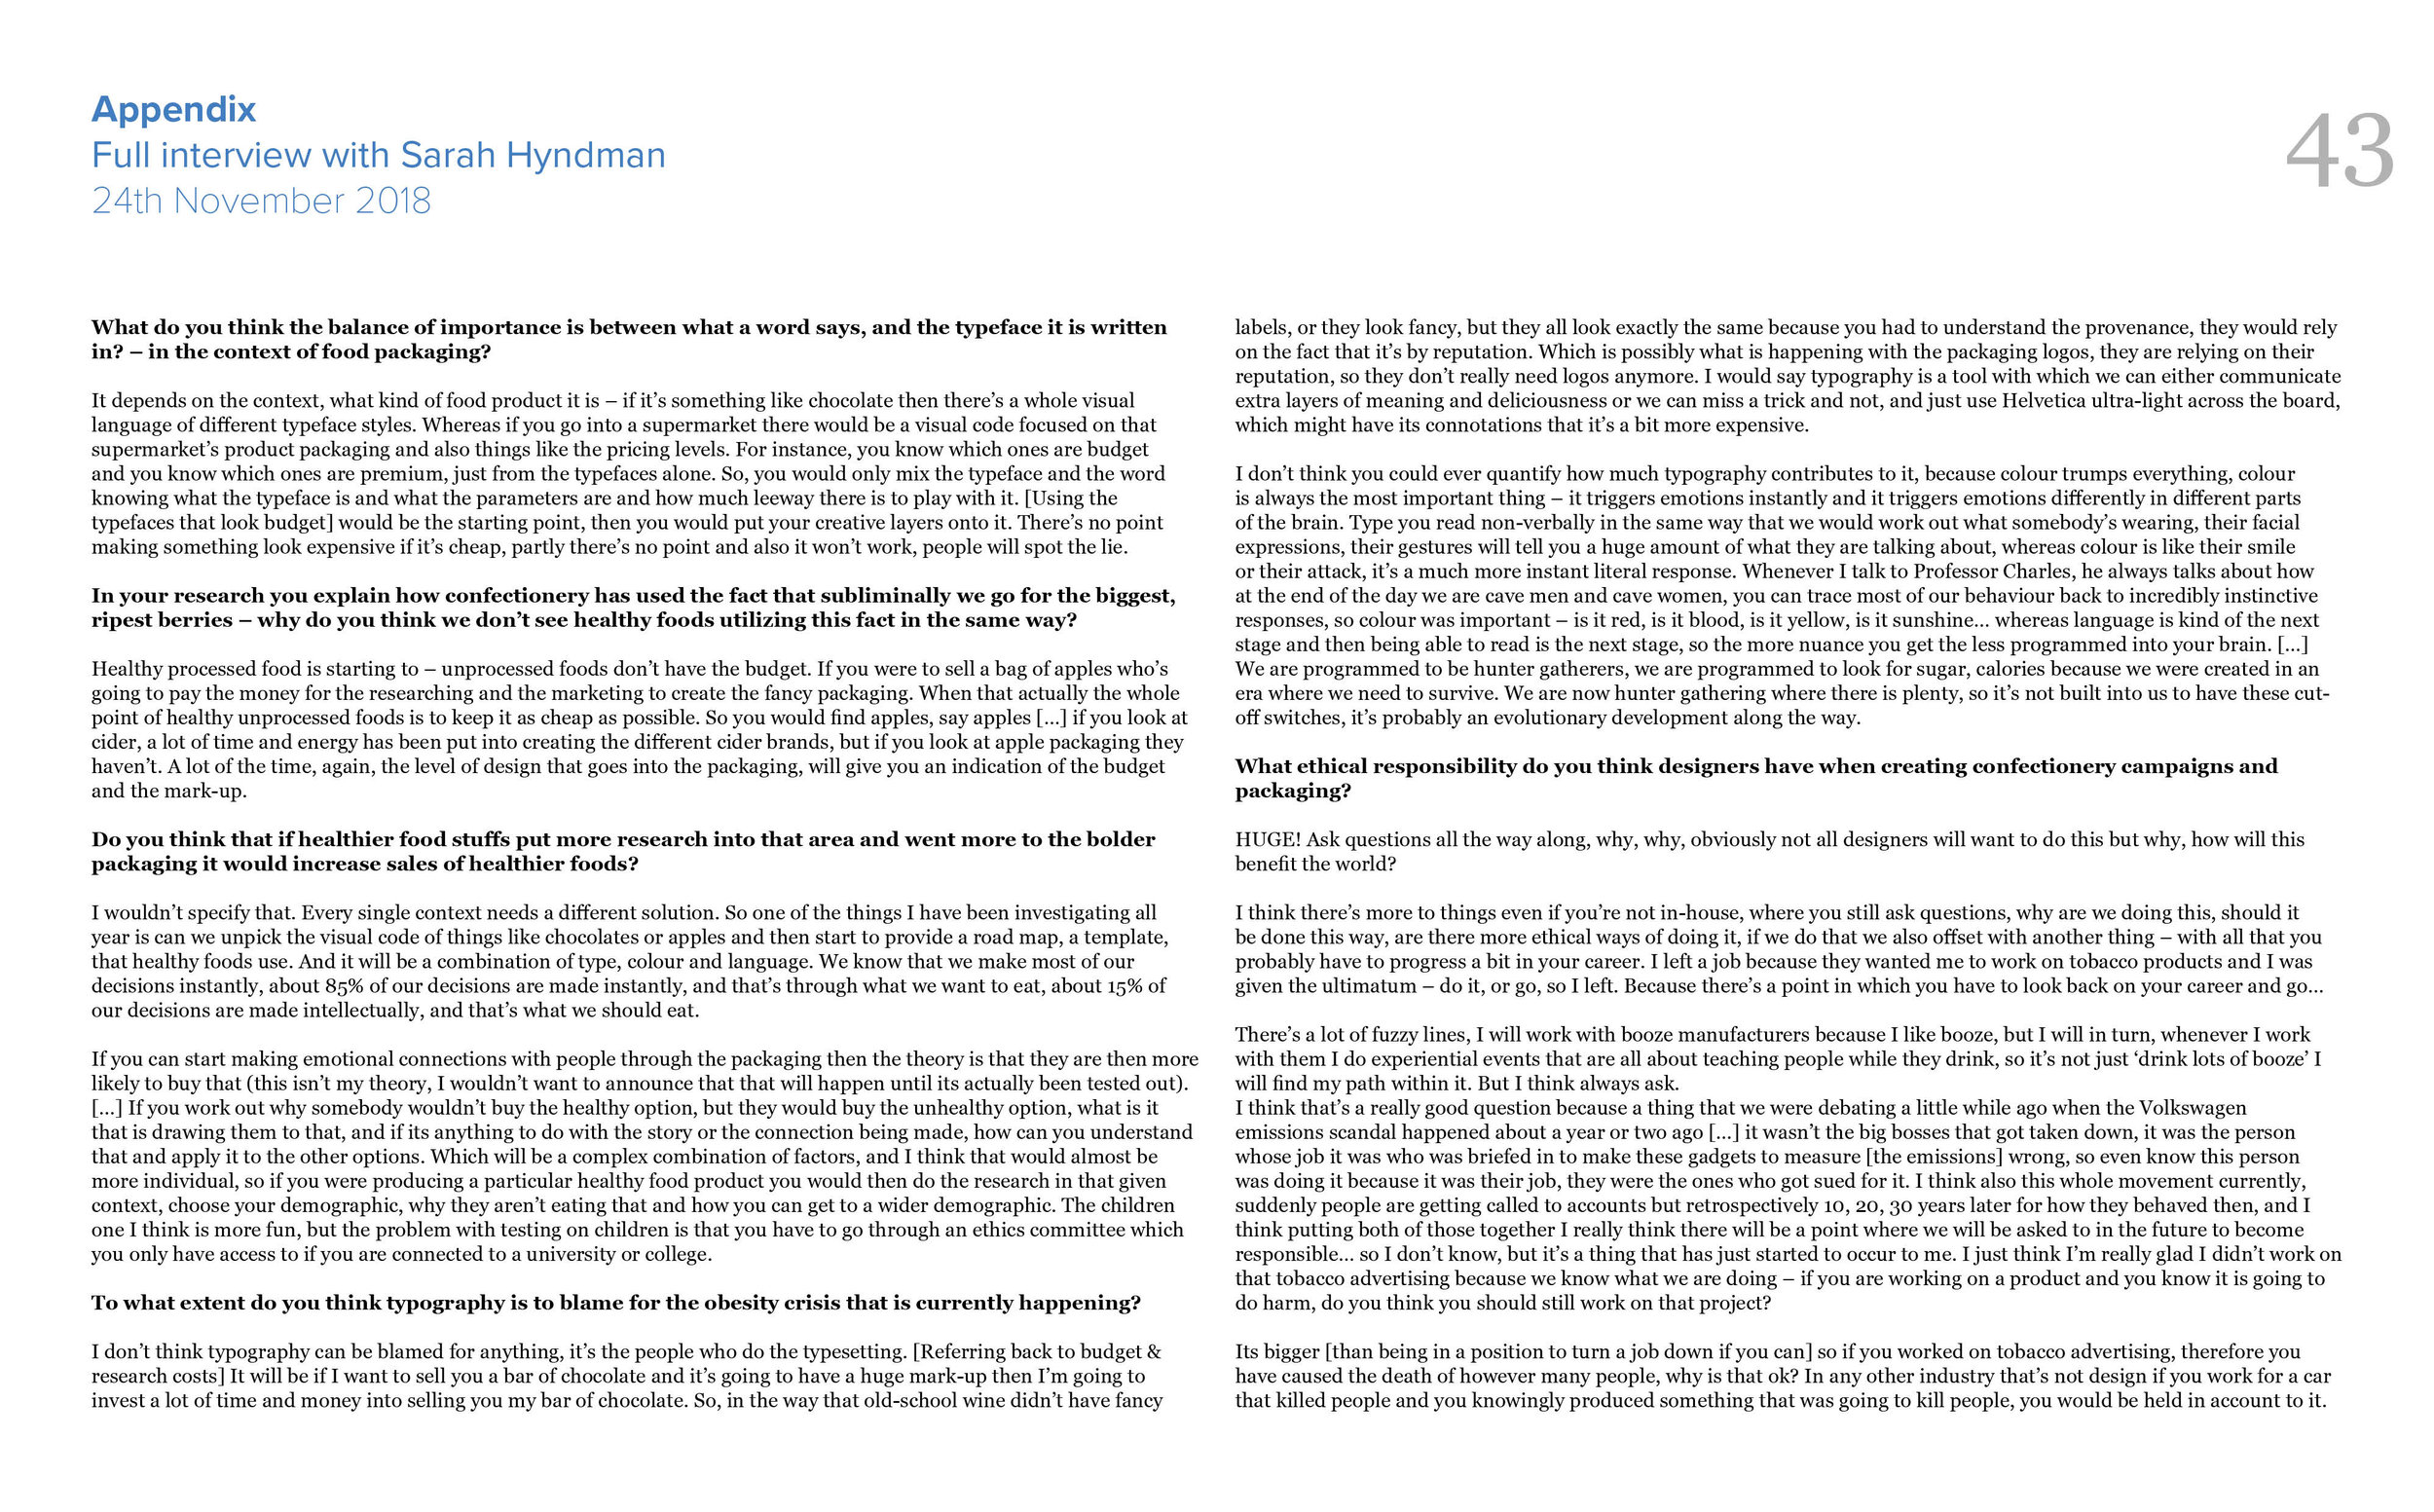 Thesis Element 2 PDF43.jpg